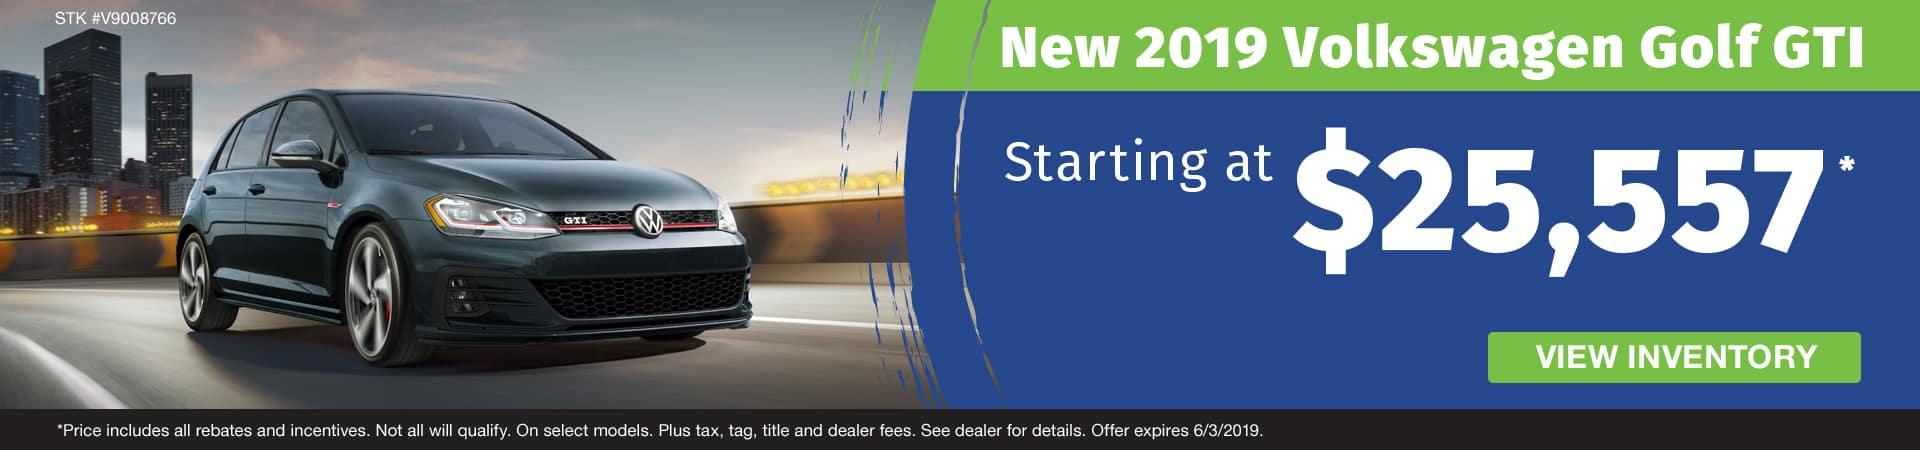 Get a new 2019 VW Golf GTI starting at $25,557 in Murfreesboro TN